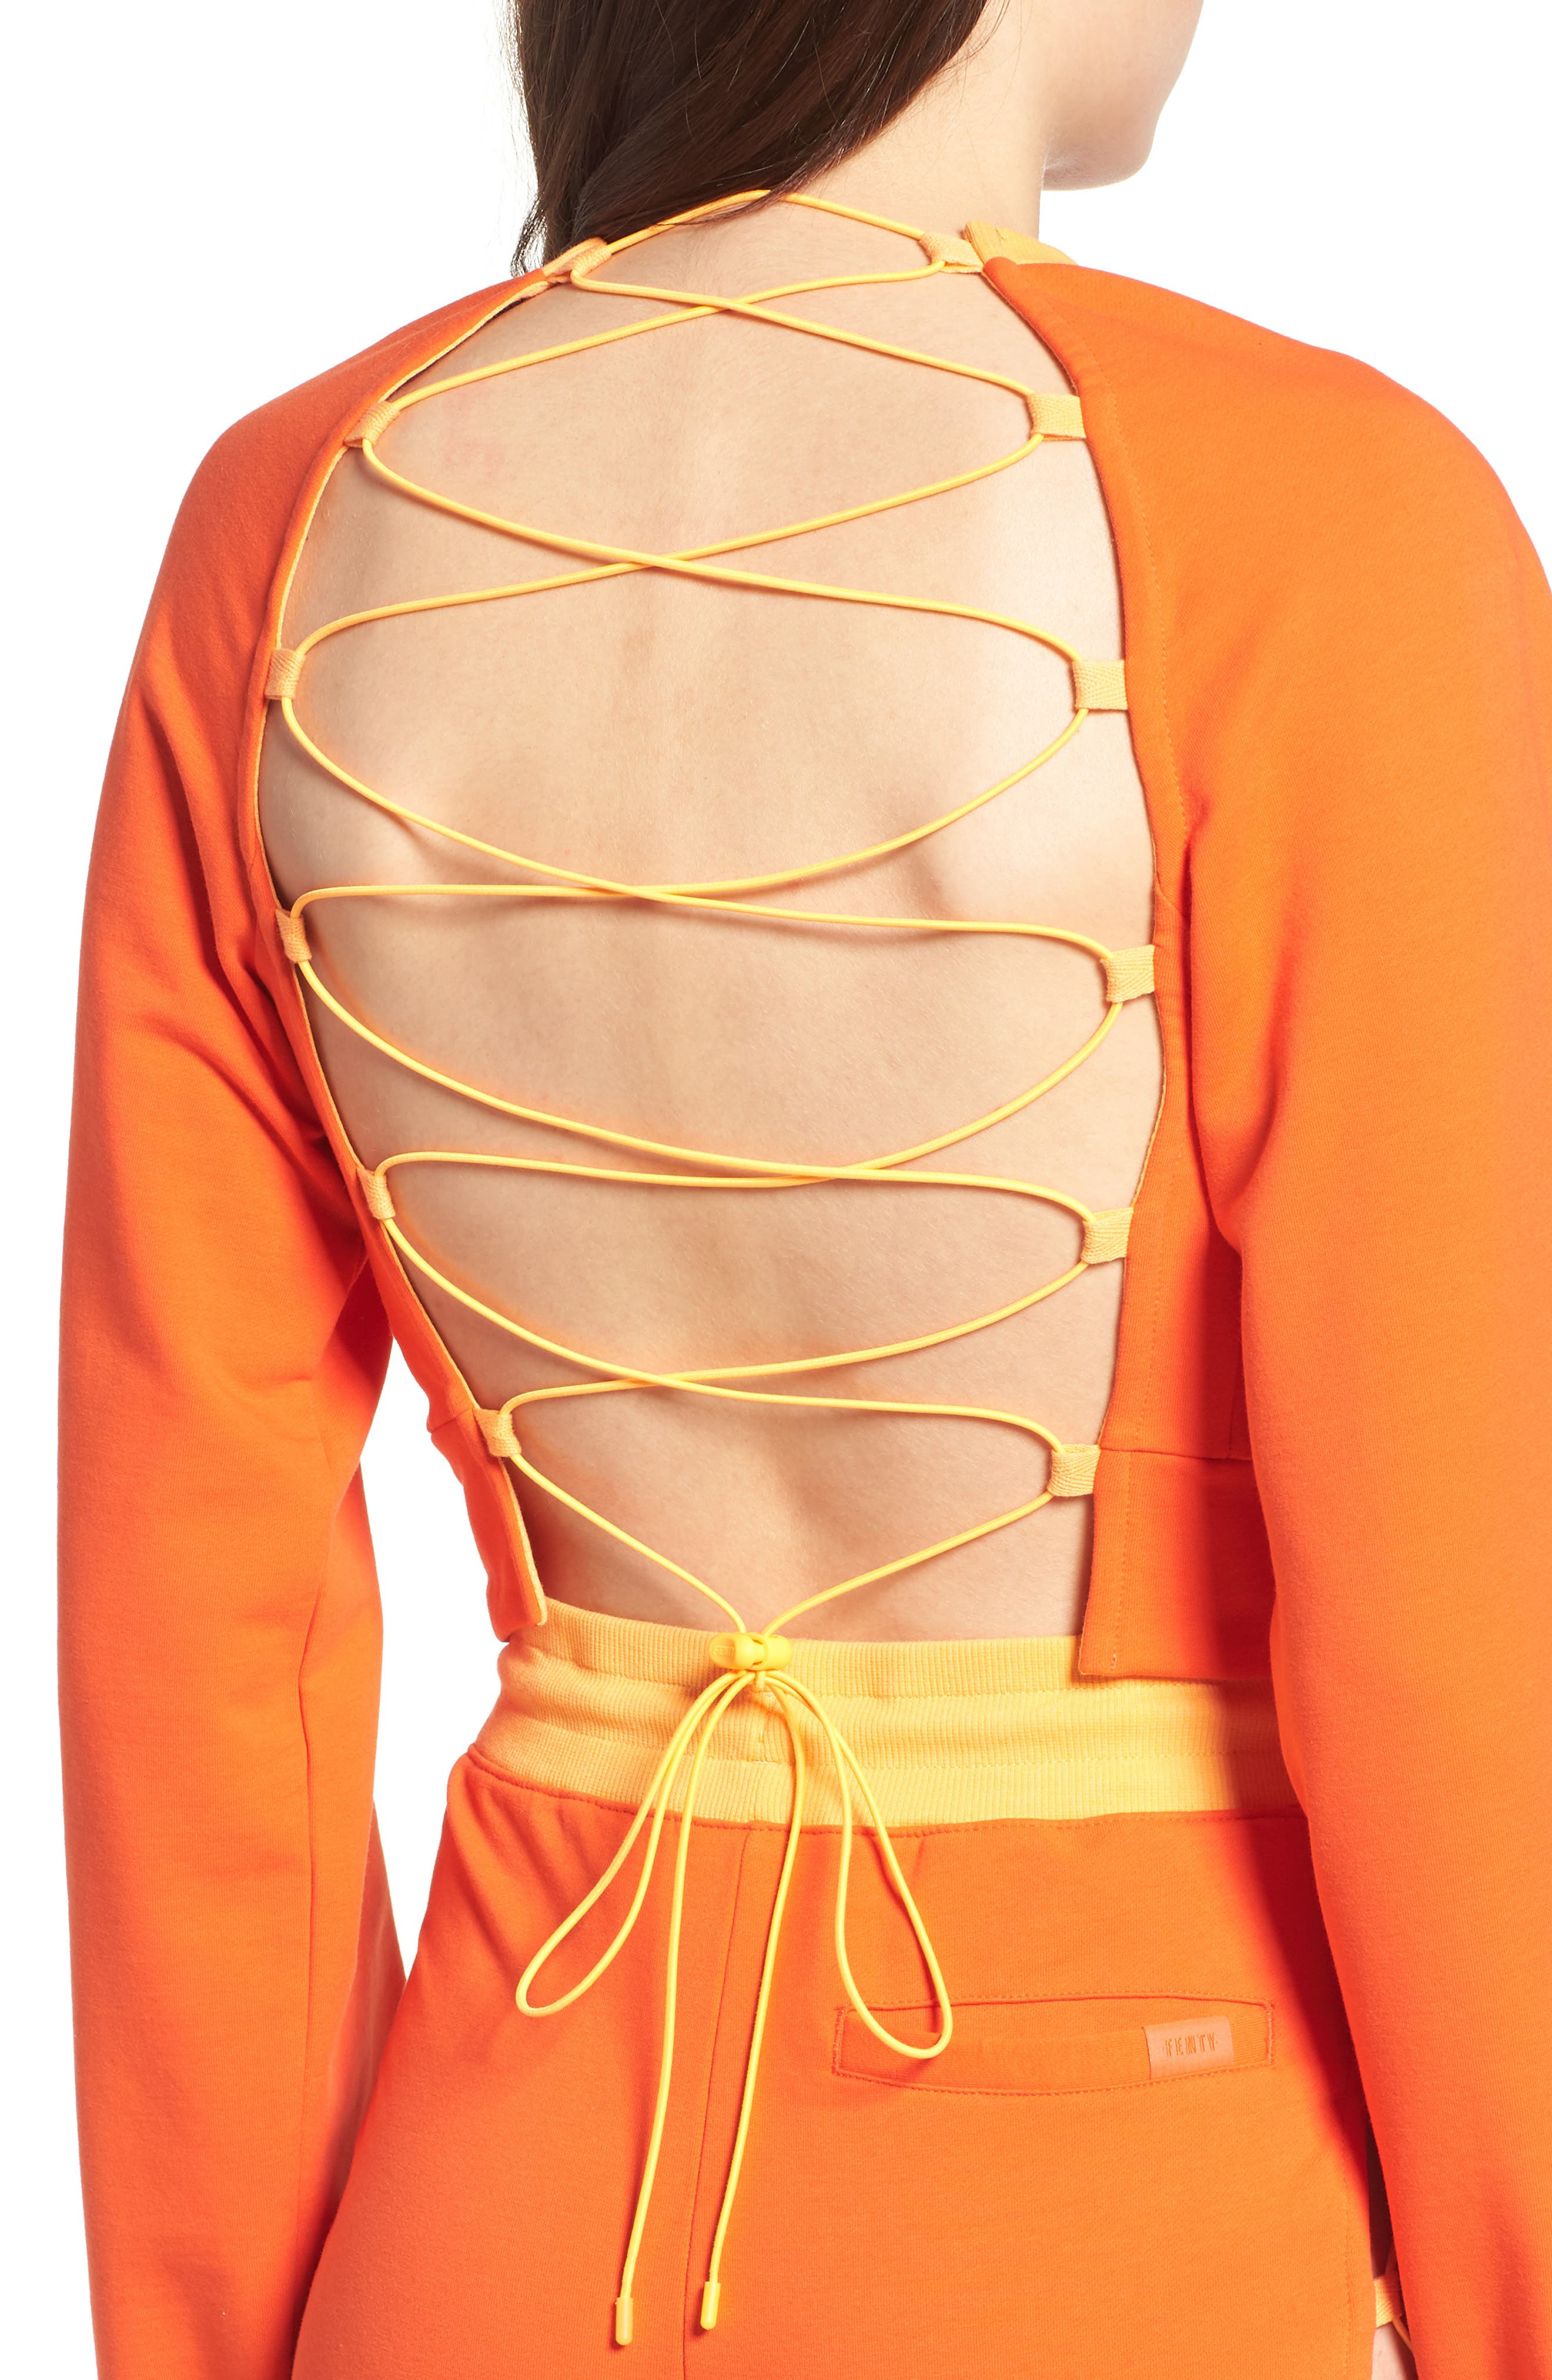 FENTY PUMA by Rihanna Lace-Up Back Sweatshirt,                             Alternate thumbnail 4, color,                             Cherry Tomato